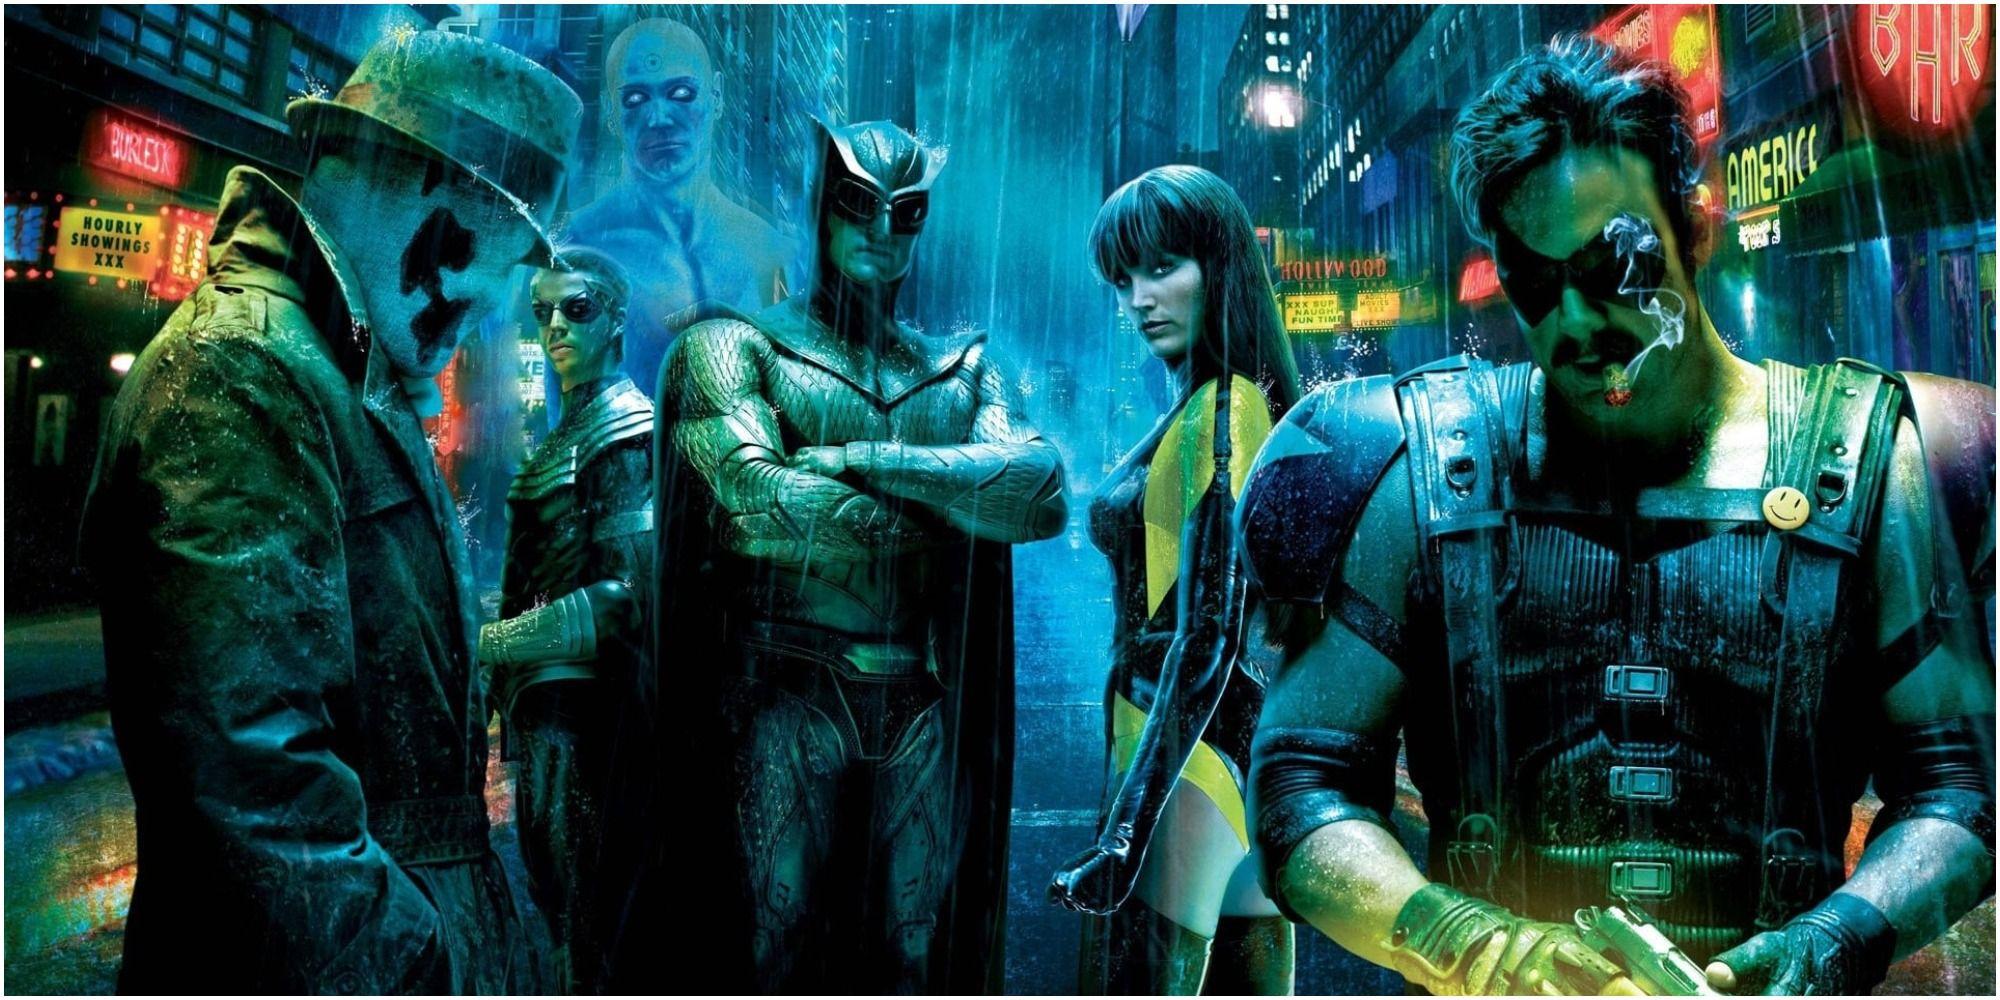 Culture Lounge: Watchmen - Zack Snyder (2009)